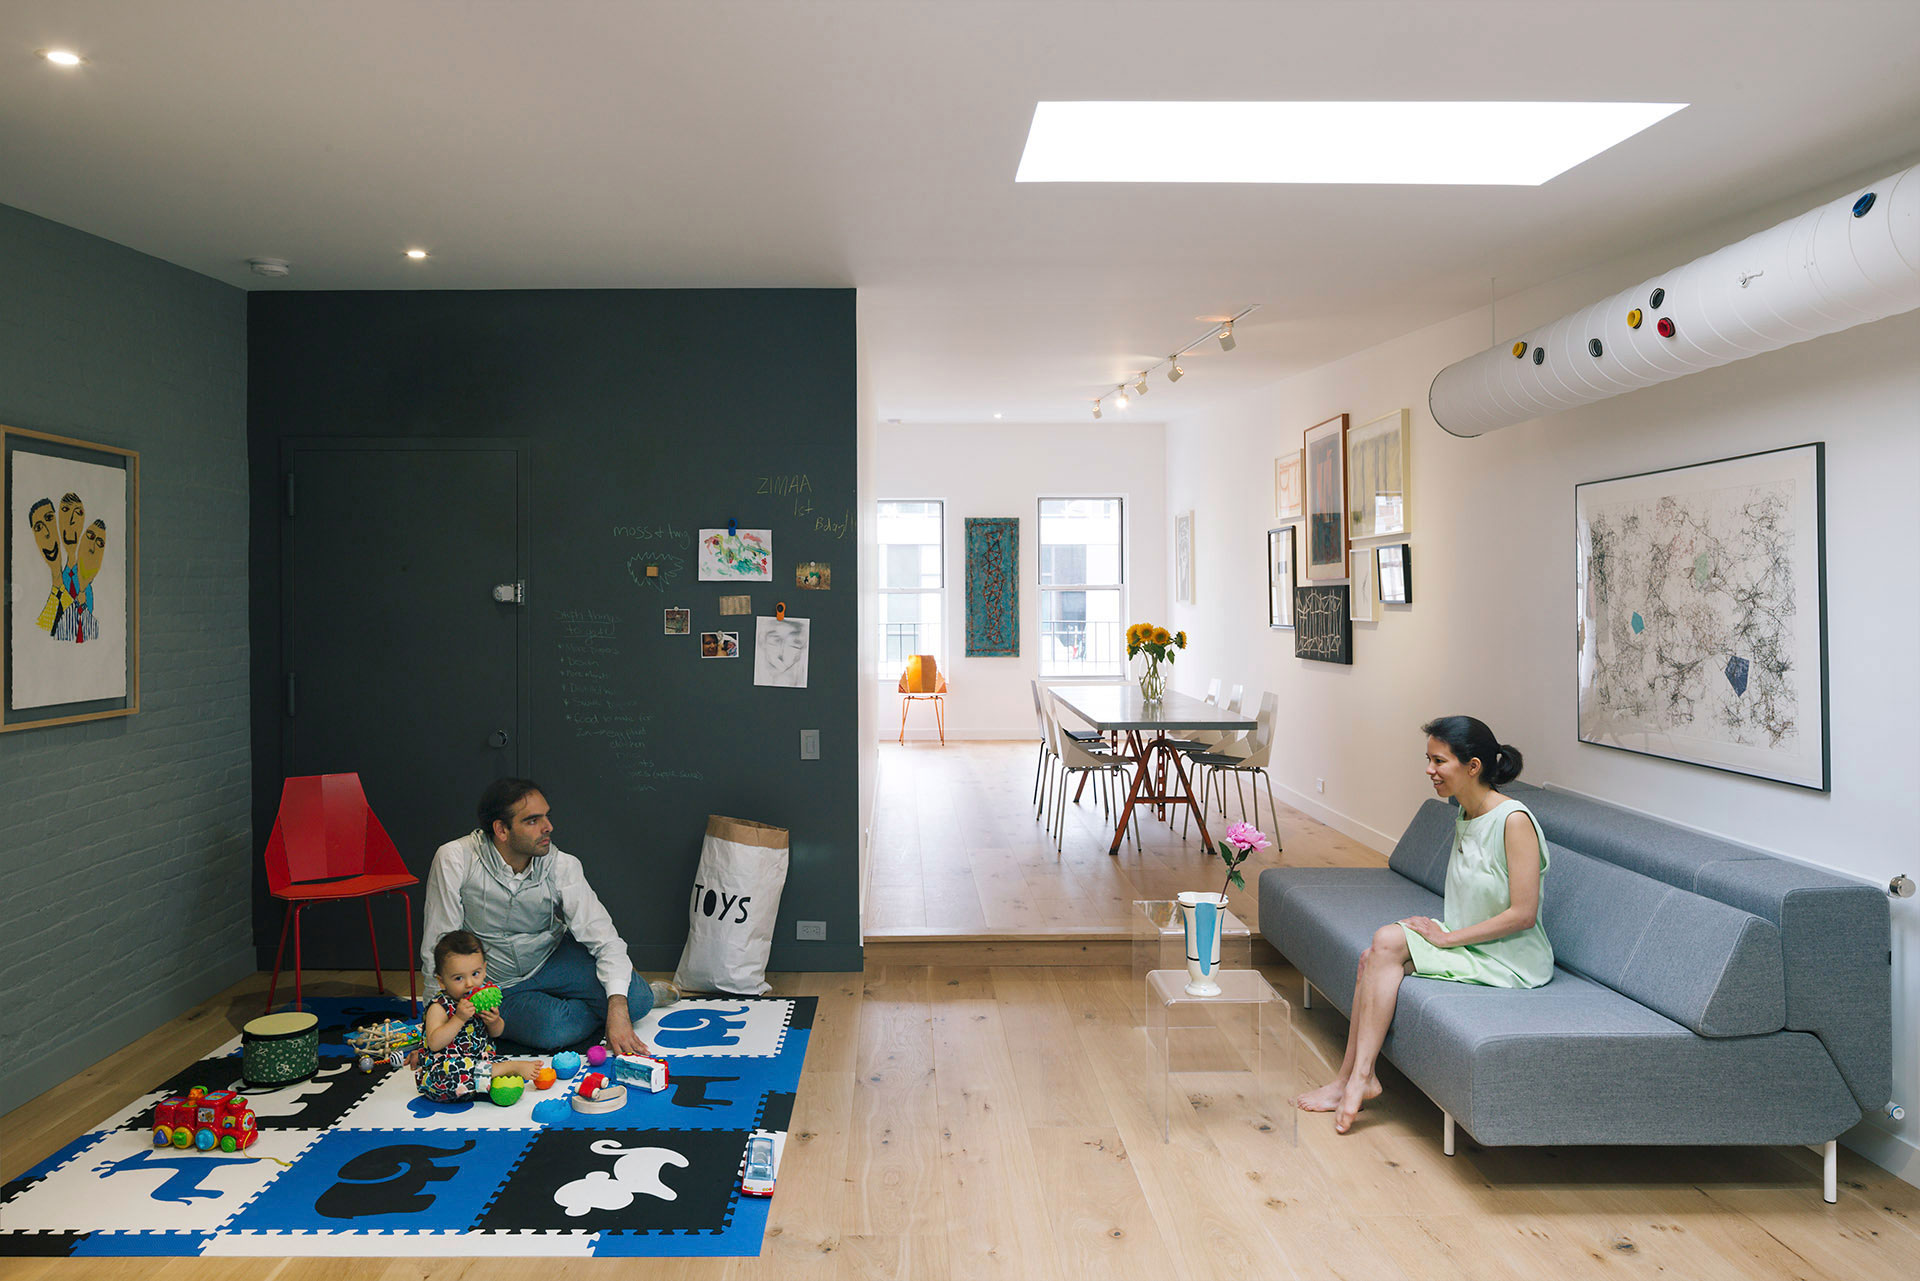 Studio Esnal Complete a Contemporary Renovation in Tribeca